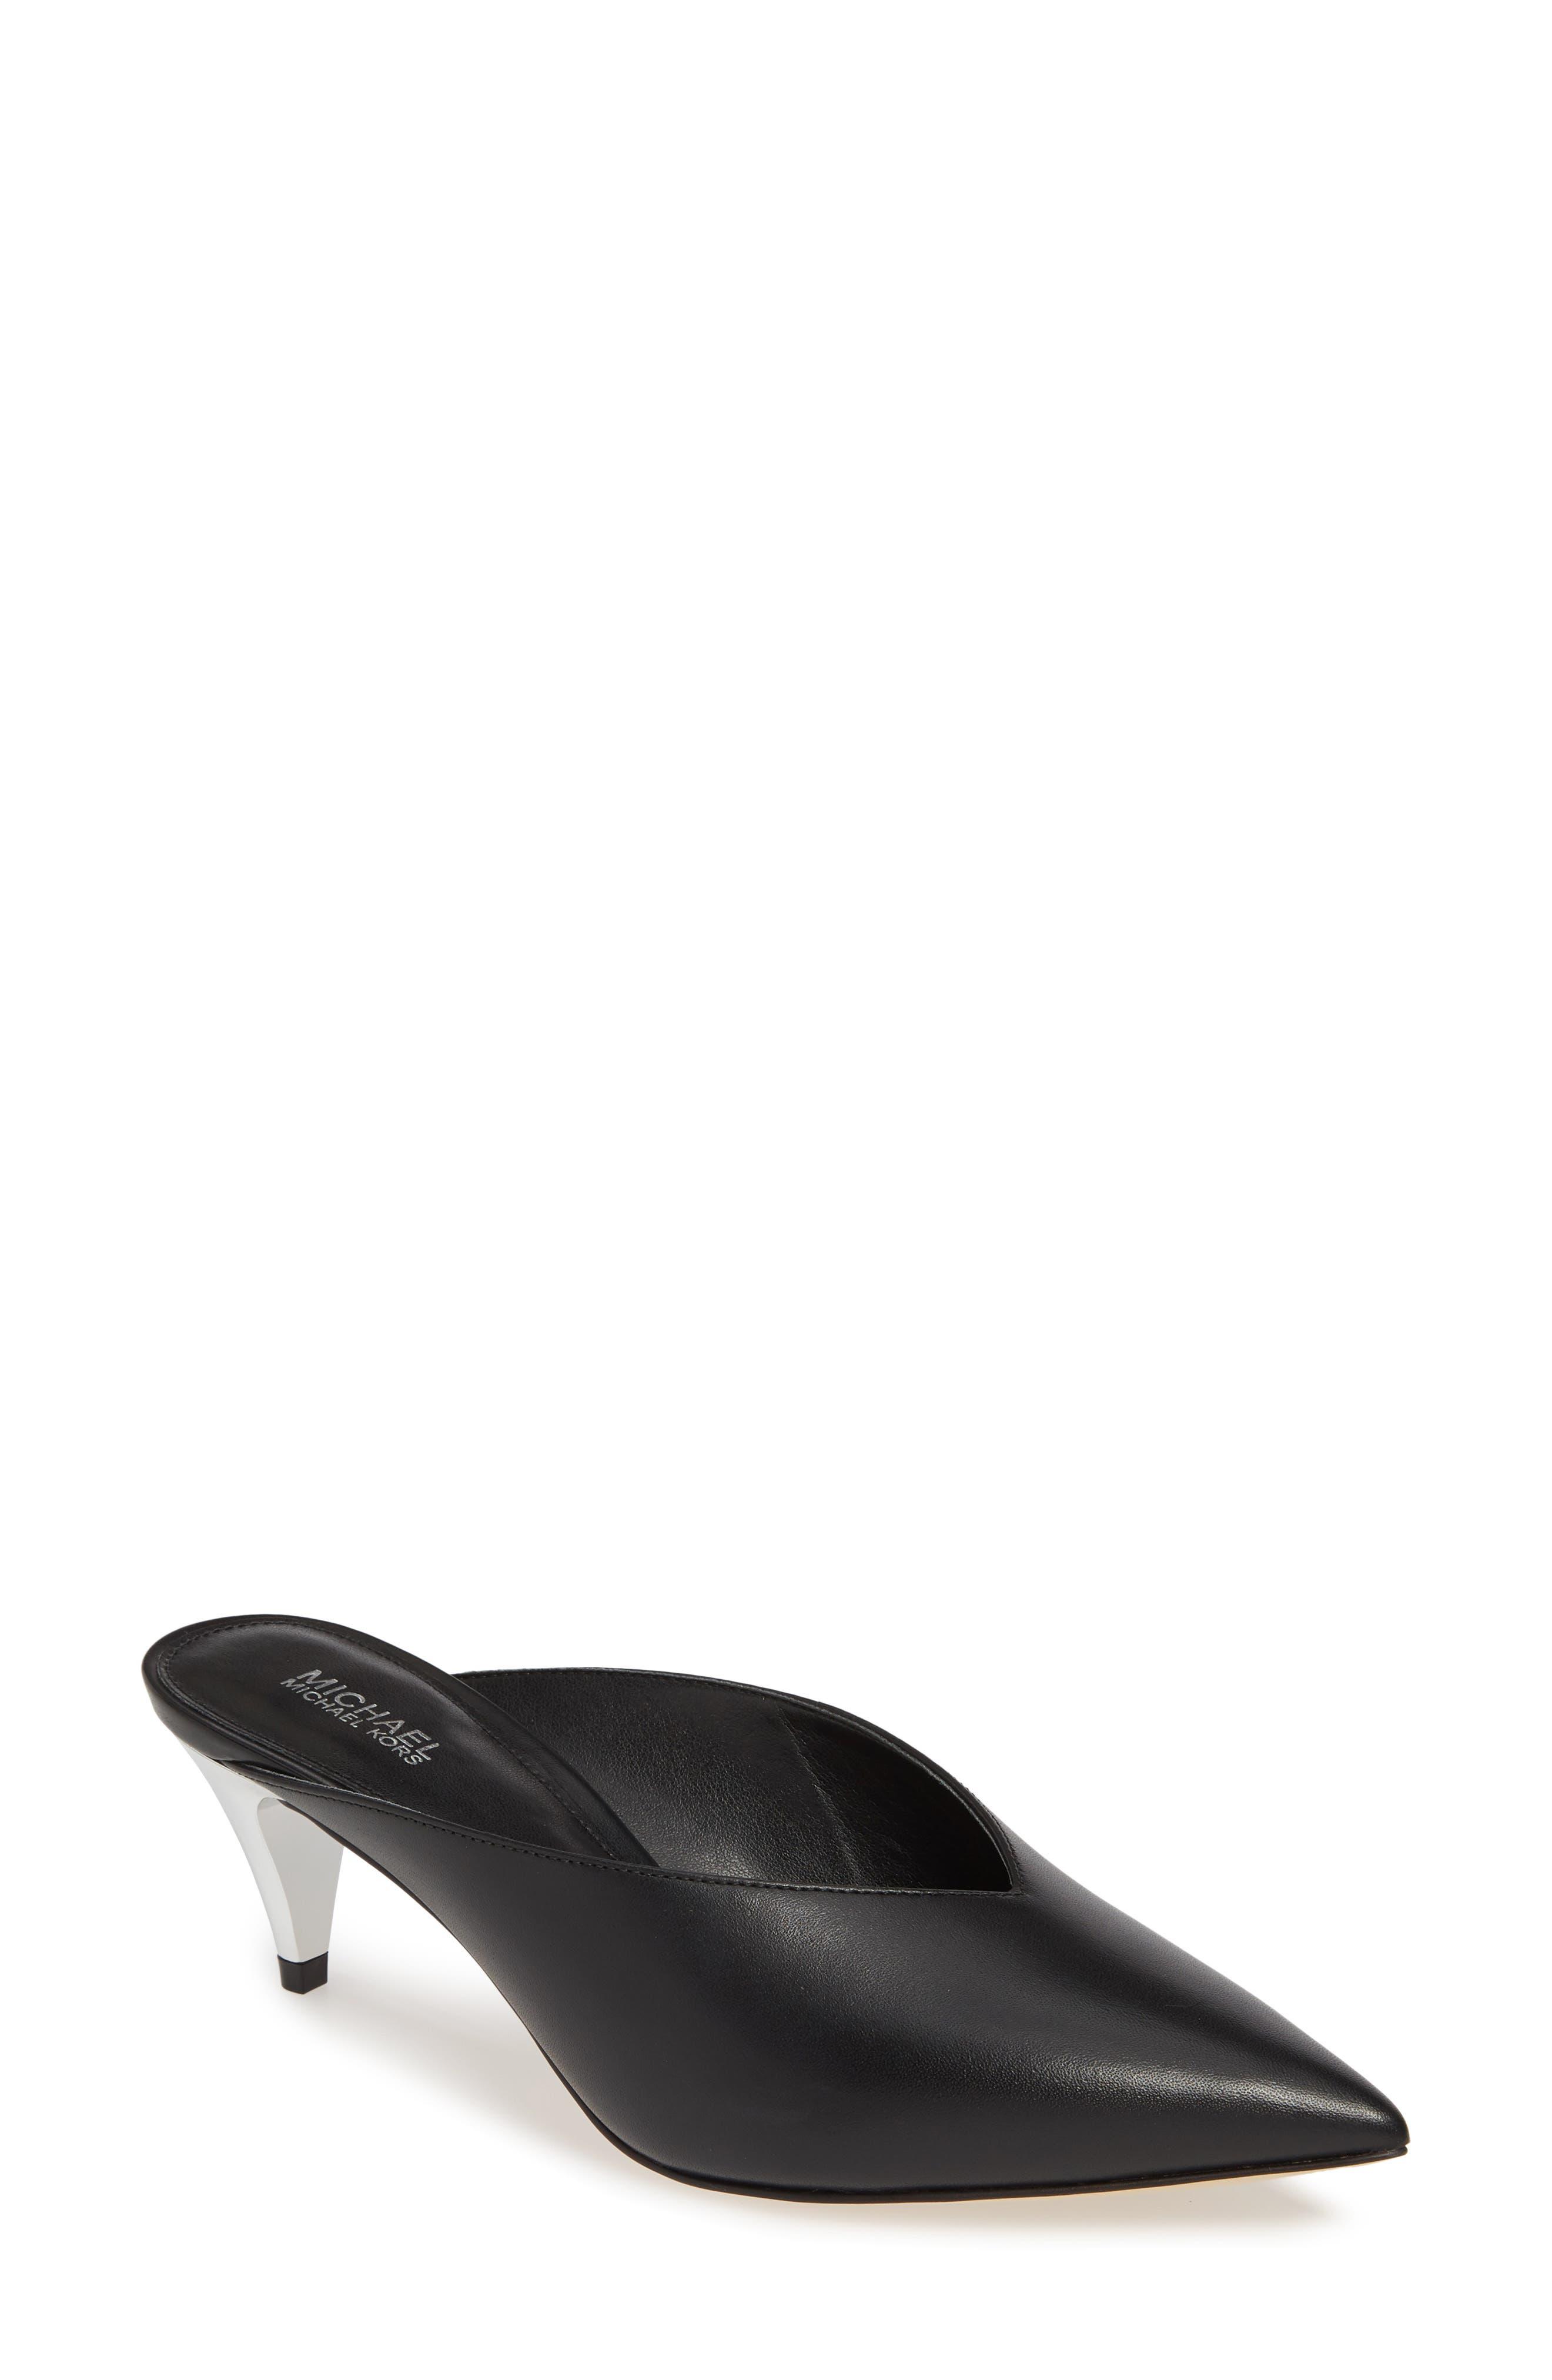 MICHAEL MICHAEL KORS, Cambria Mule, Main thumbnail 1, color, BLACK VACHETTA LEATHER